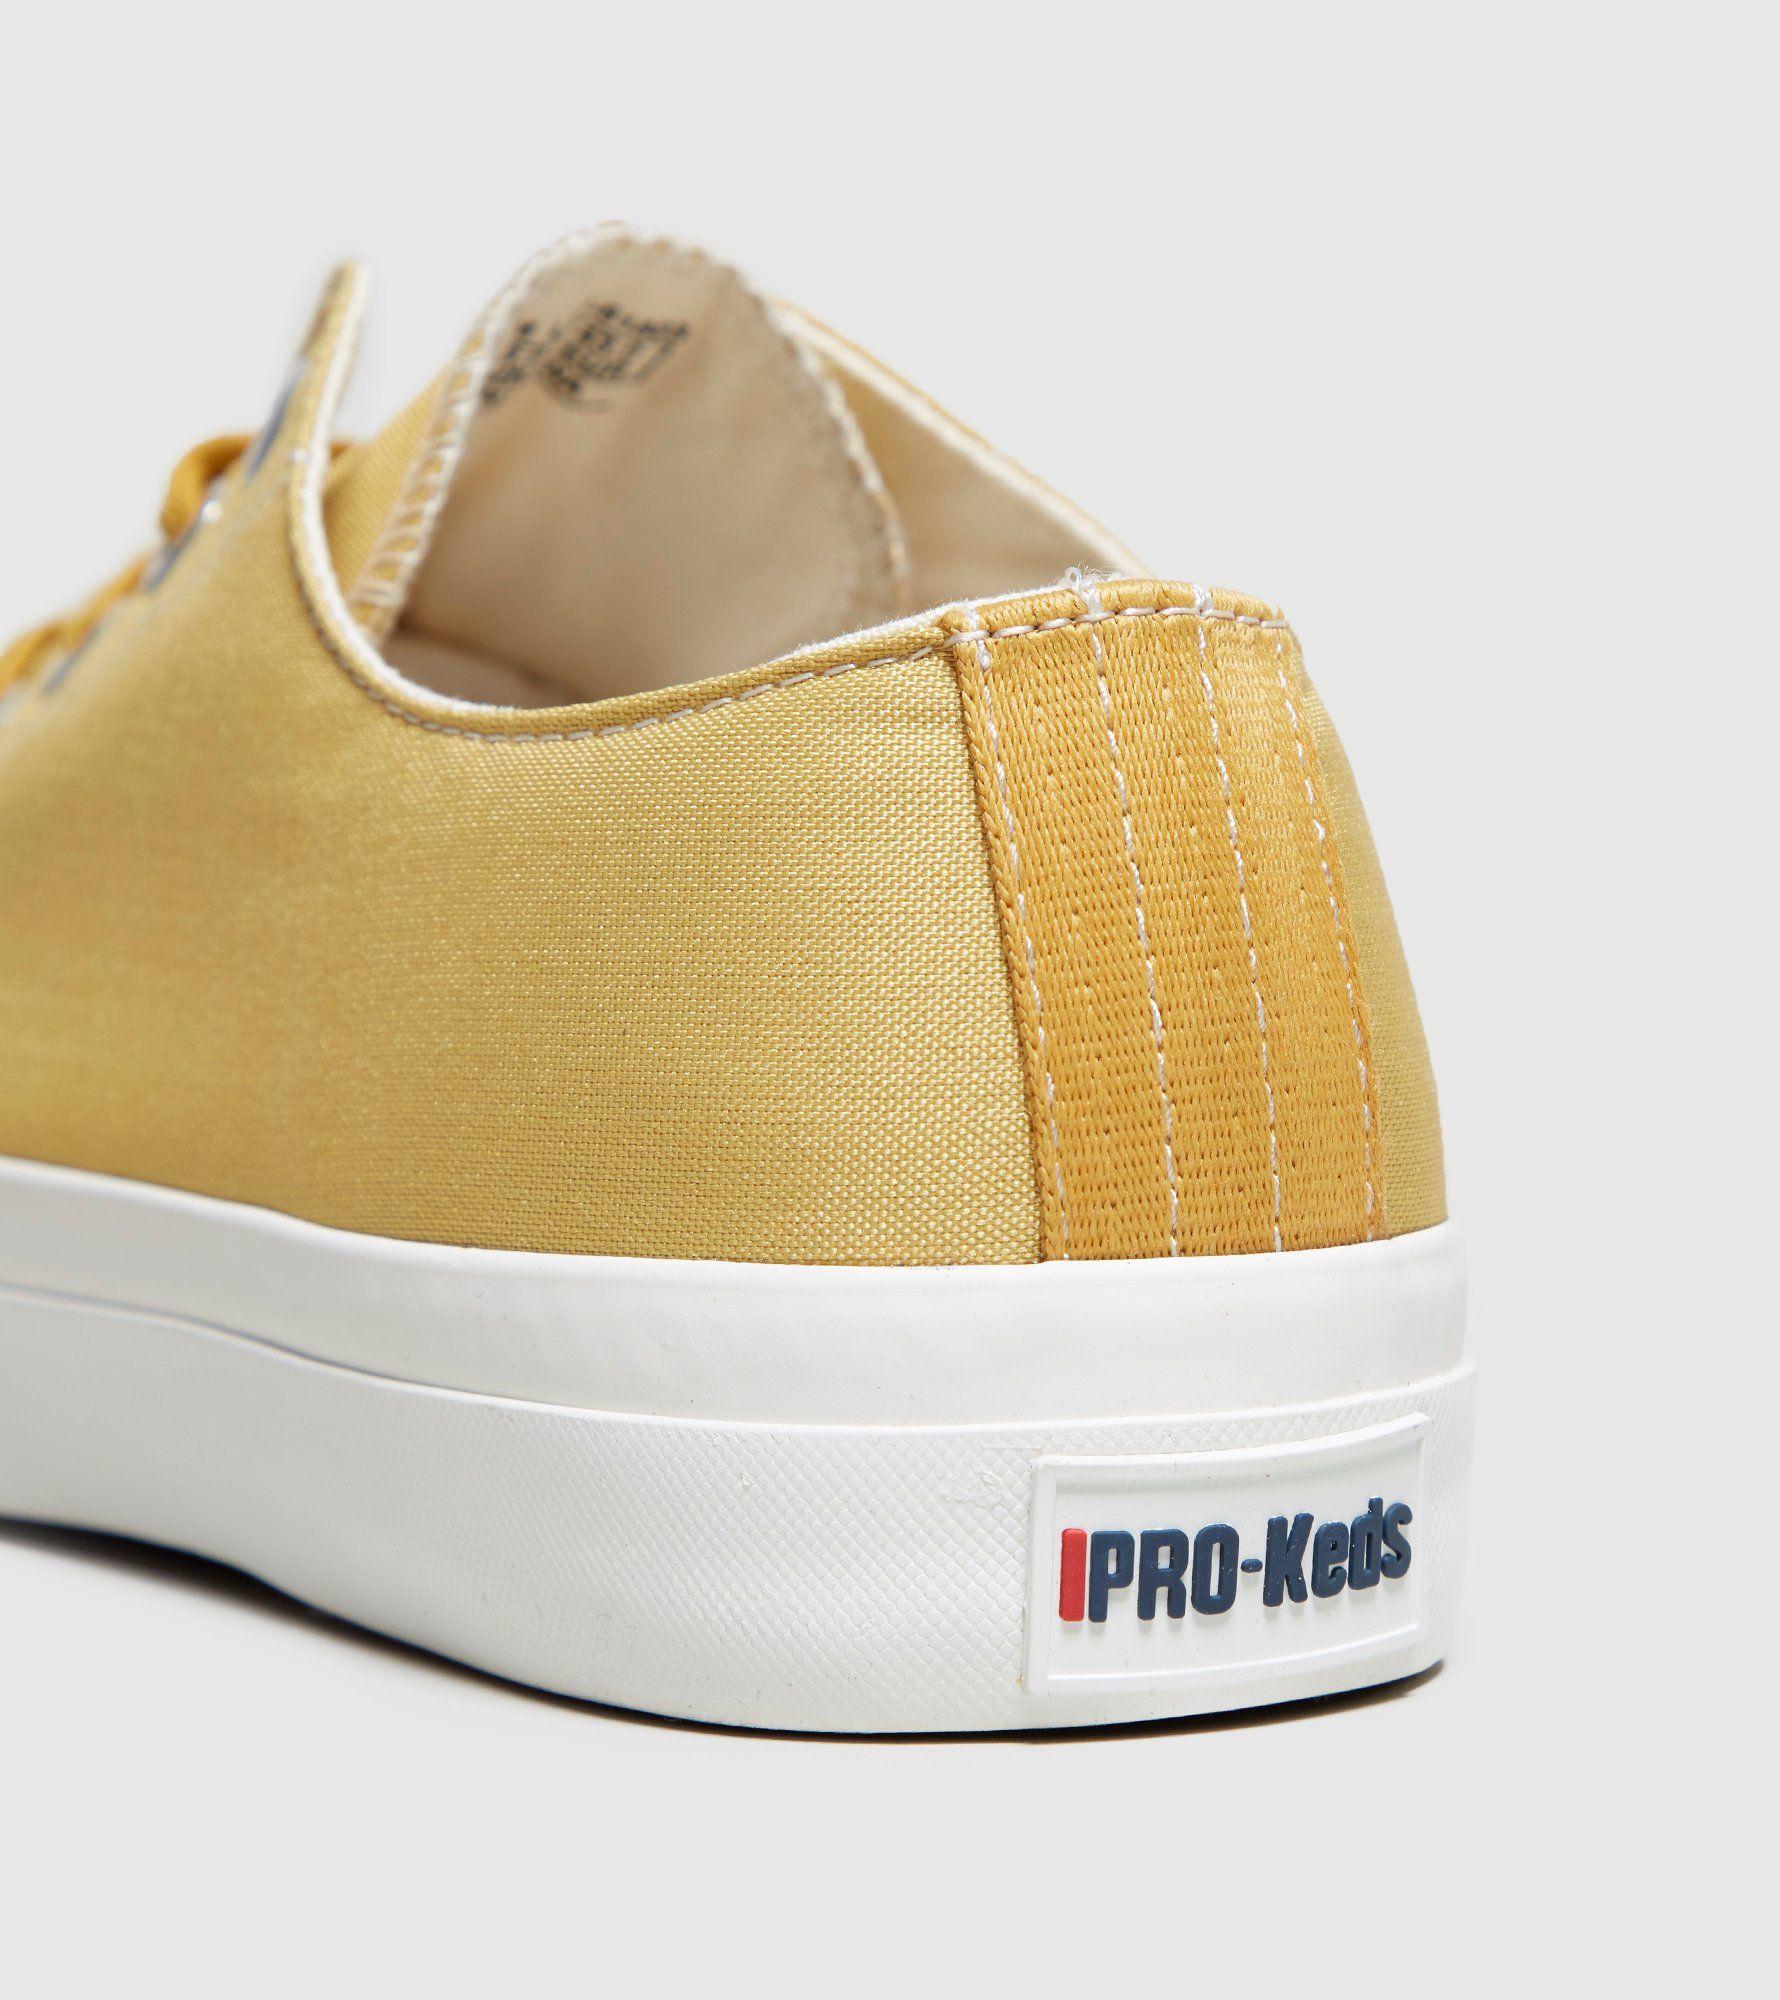 Pro-Keds Royal Lo